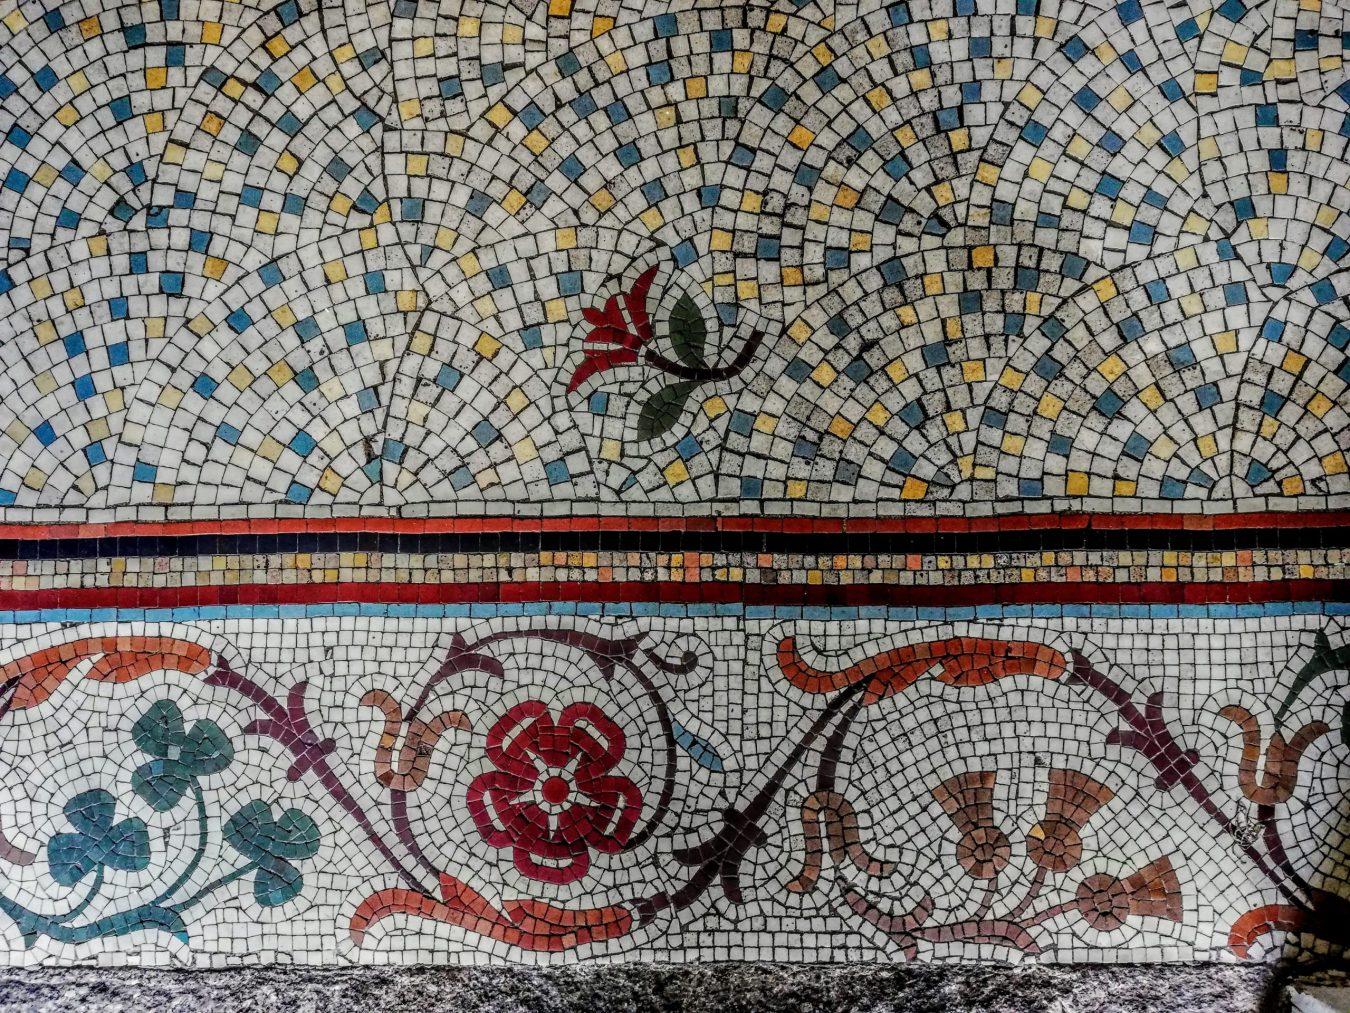 Hall Mosaic